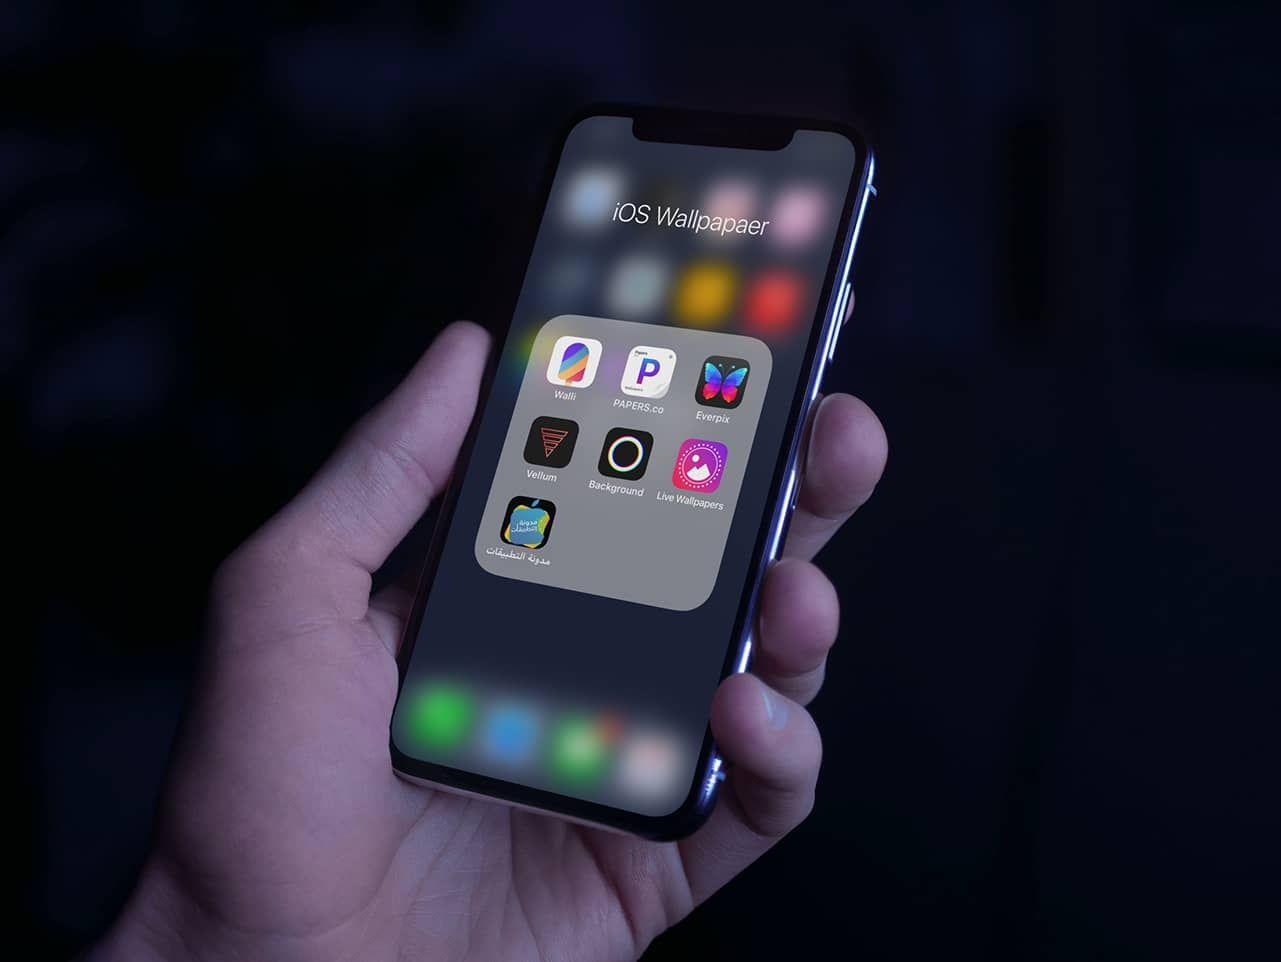 افضل تطبيقات خلفيات الايفون Galaxy Phone Phone Samsung Galaxy Phone